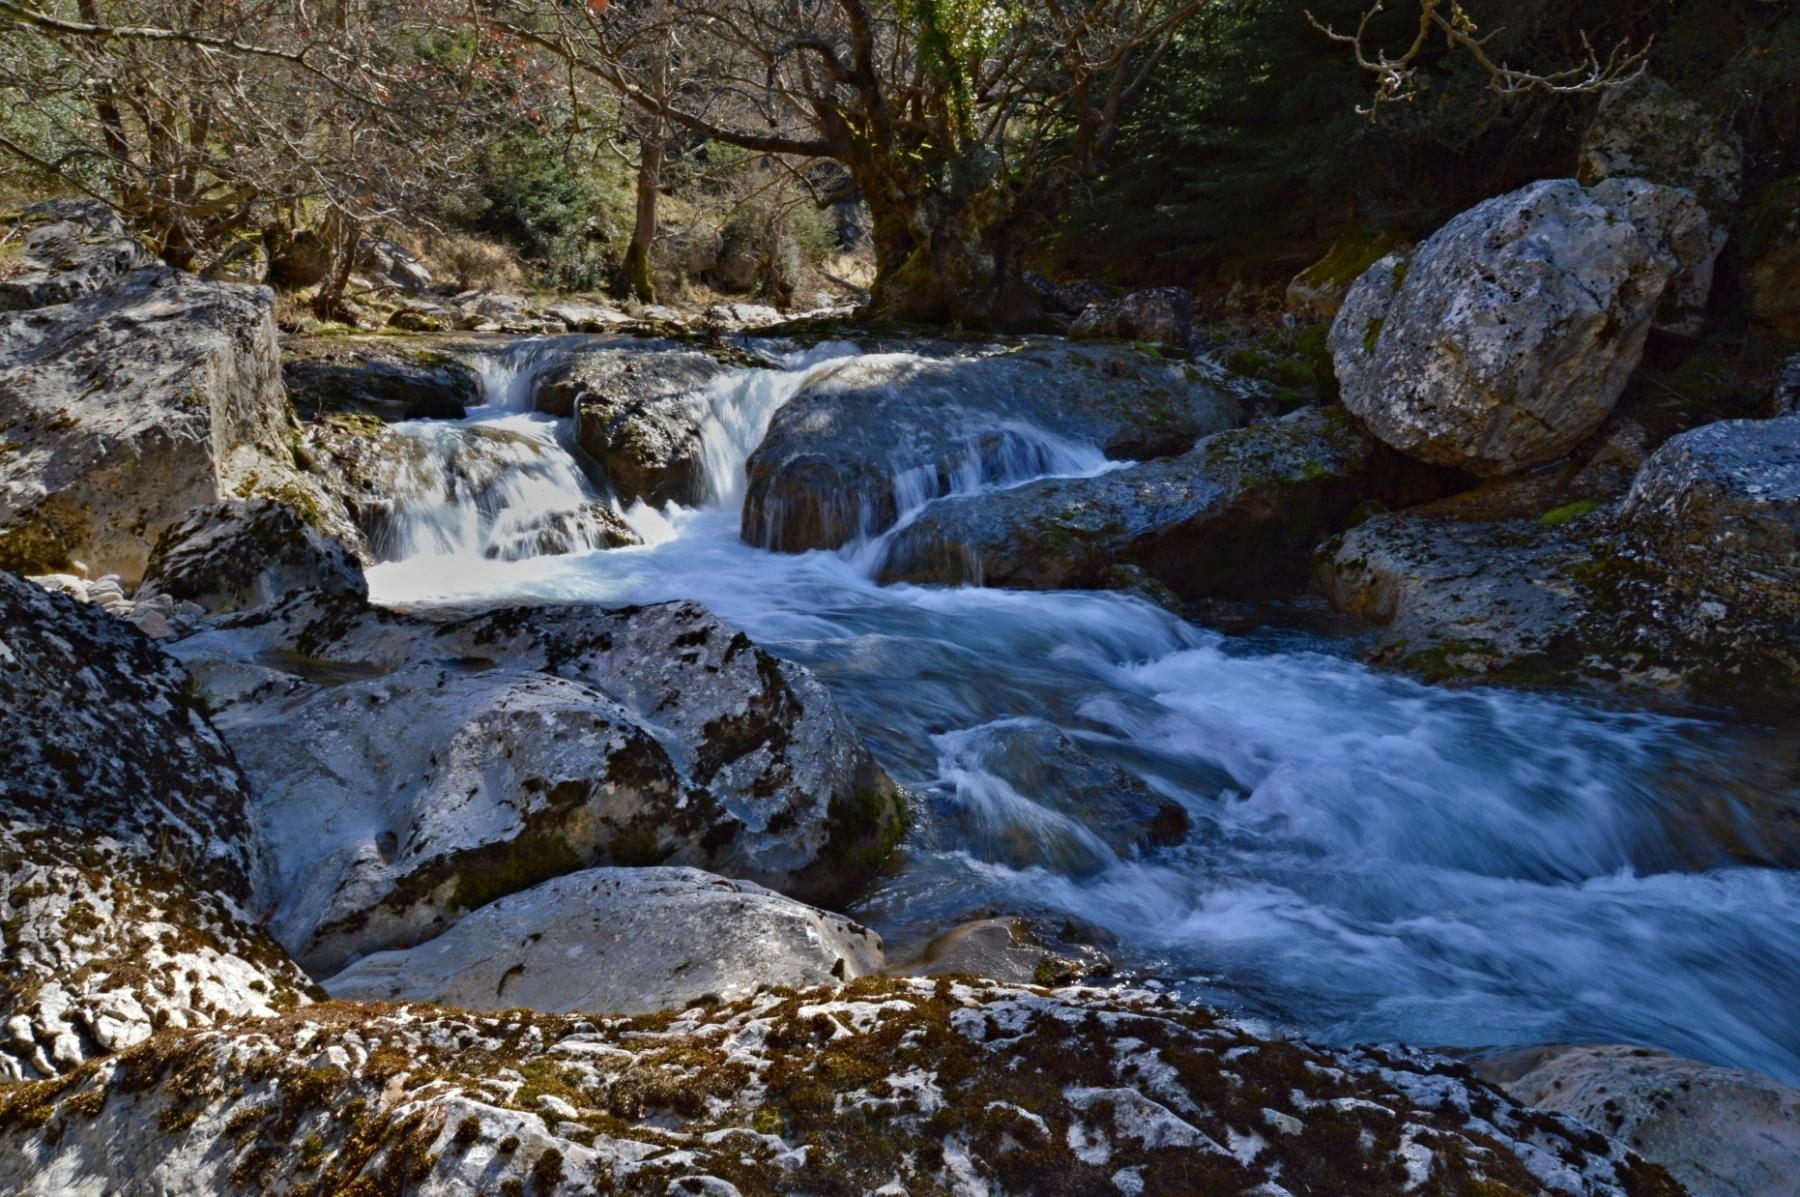 Vytina and the Mylaontas River, Arcadia, Greece